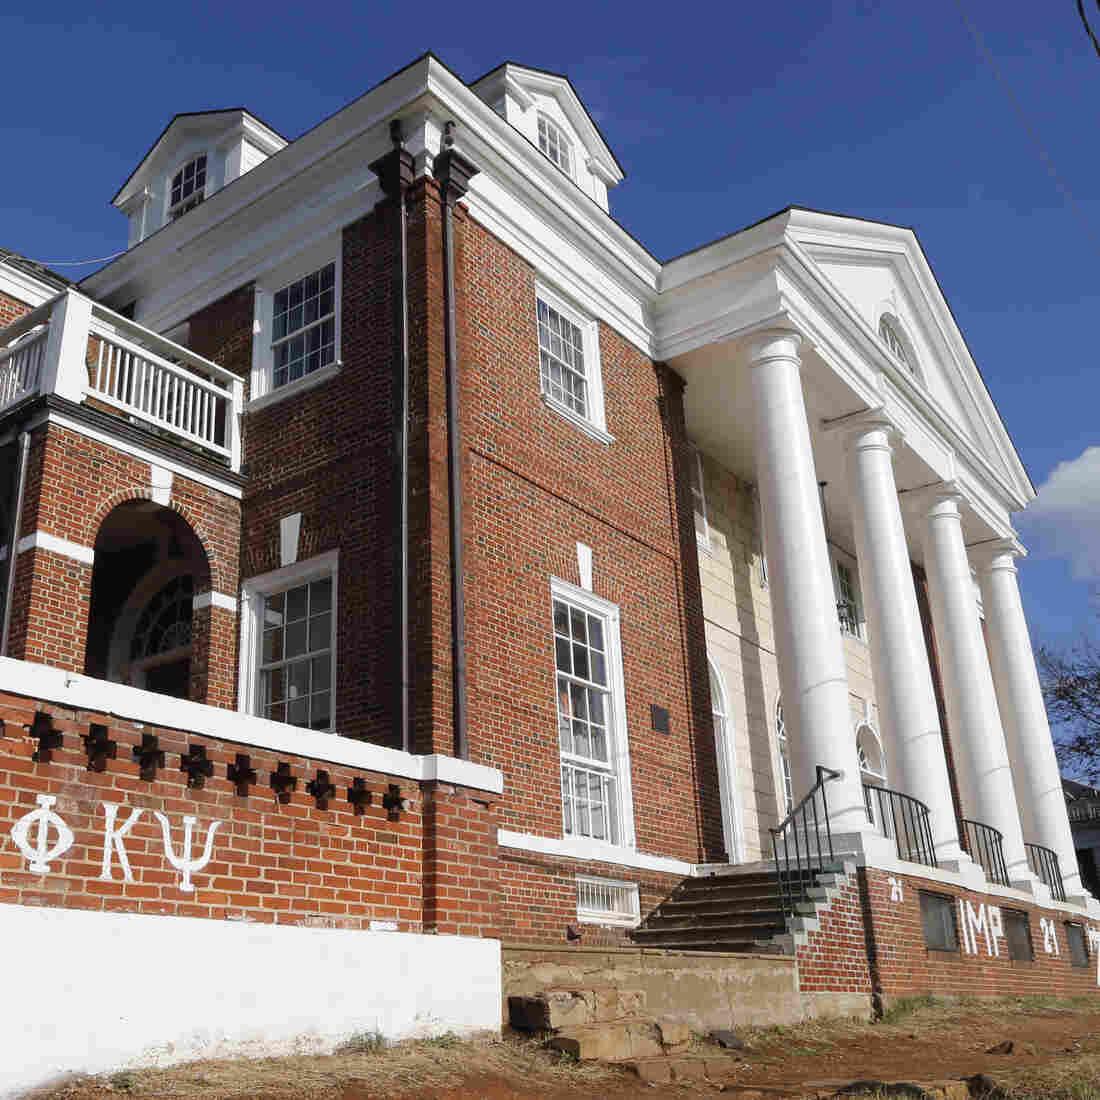 U.Va. Reinstates Fraternity Accused In 'Rolling Stone' Rape Story